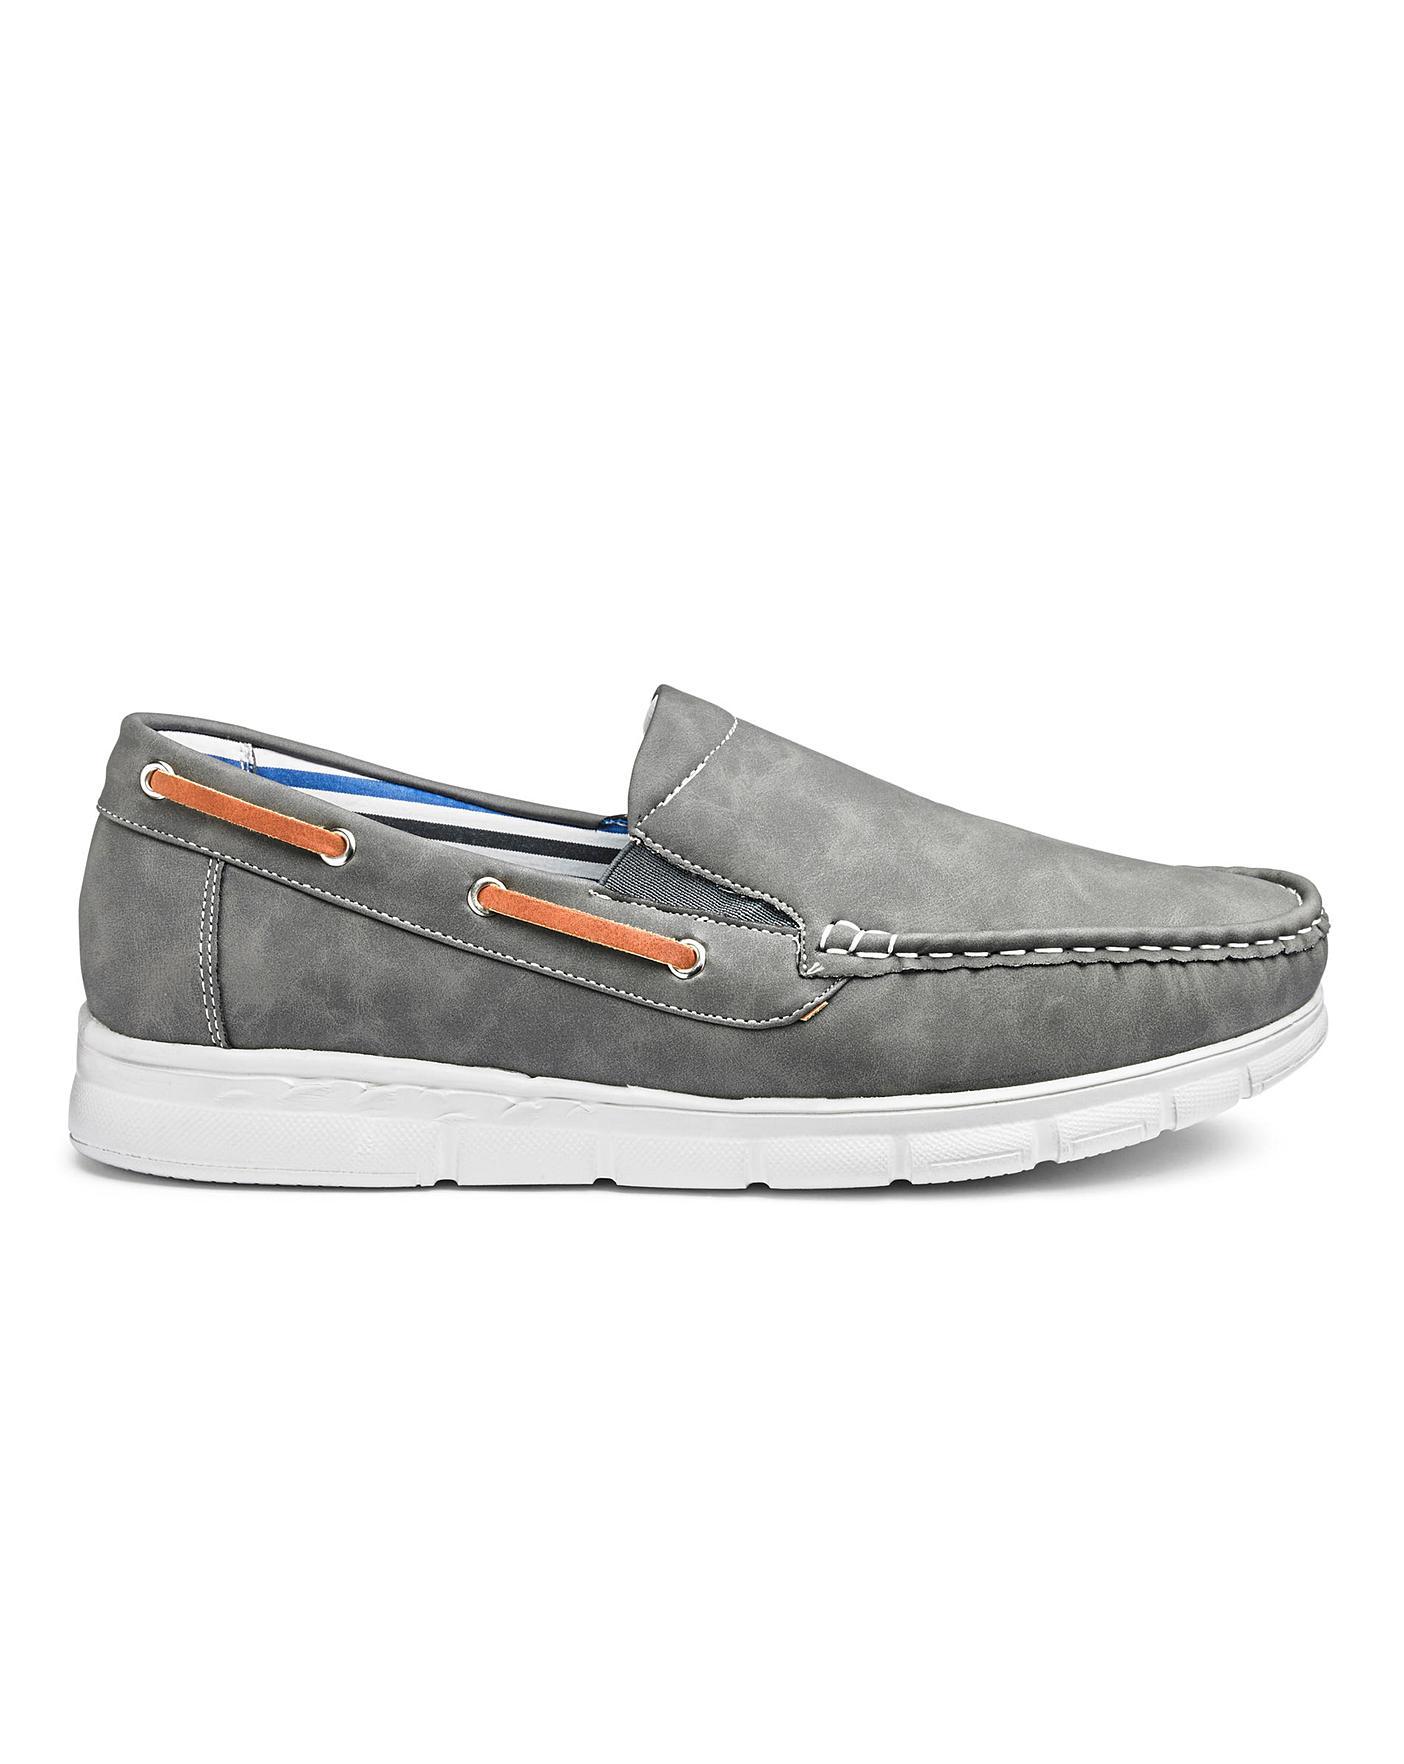 Cushion Walk Slip On Boat Shoes Wide